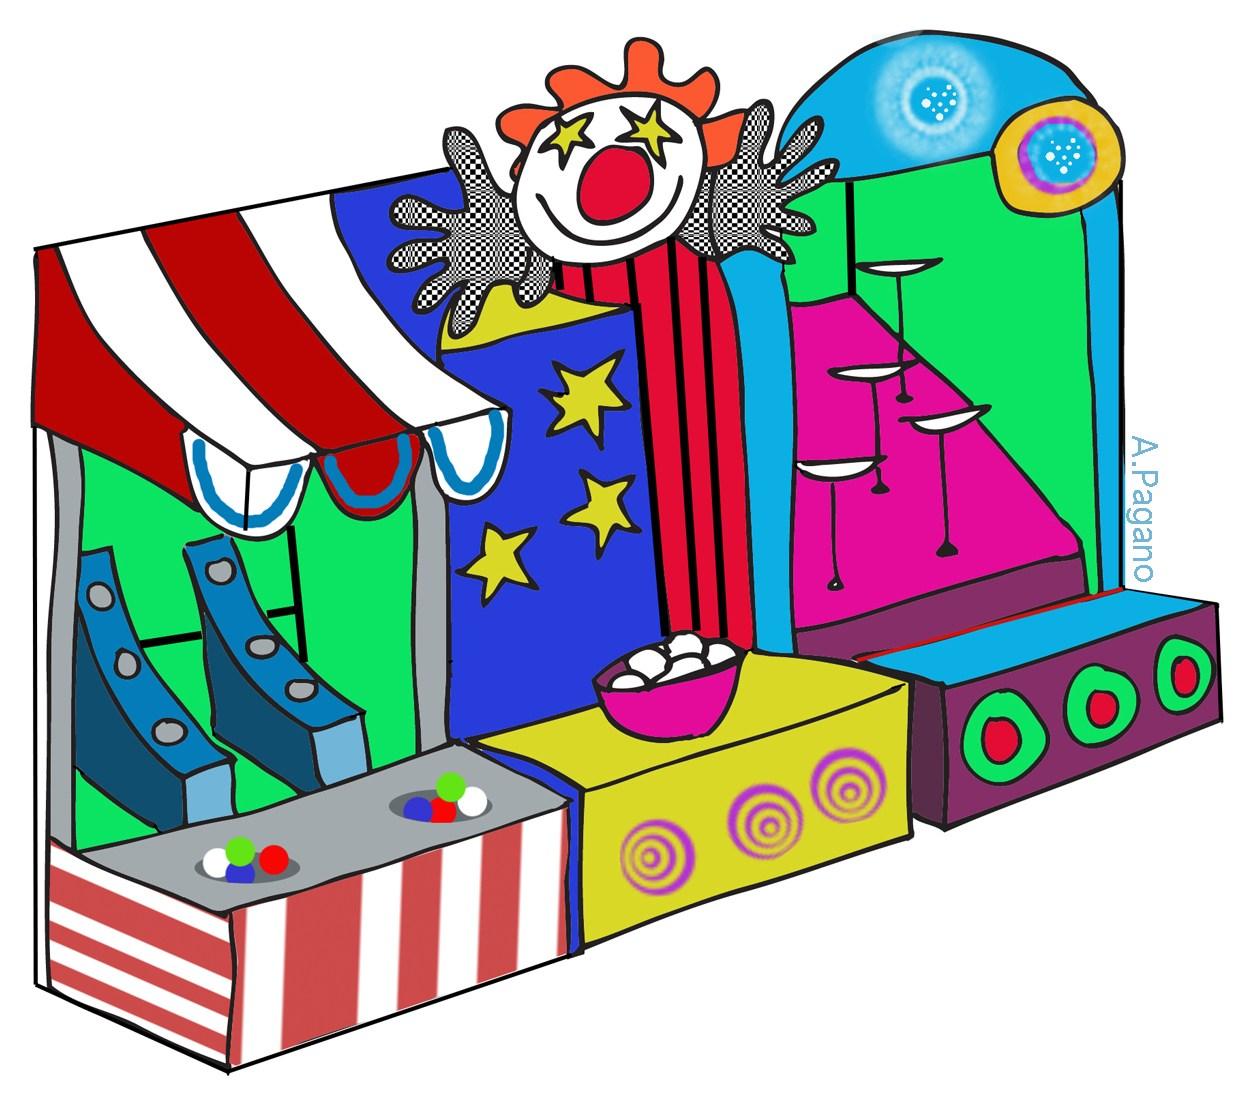 School carnival clipart 4 » Clipart Portal.